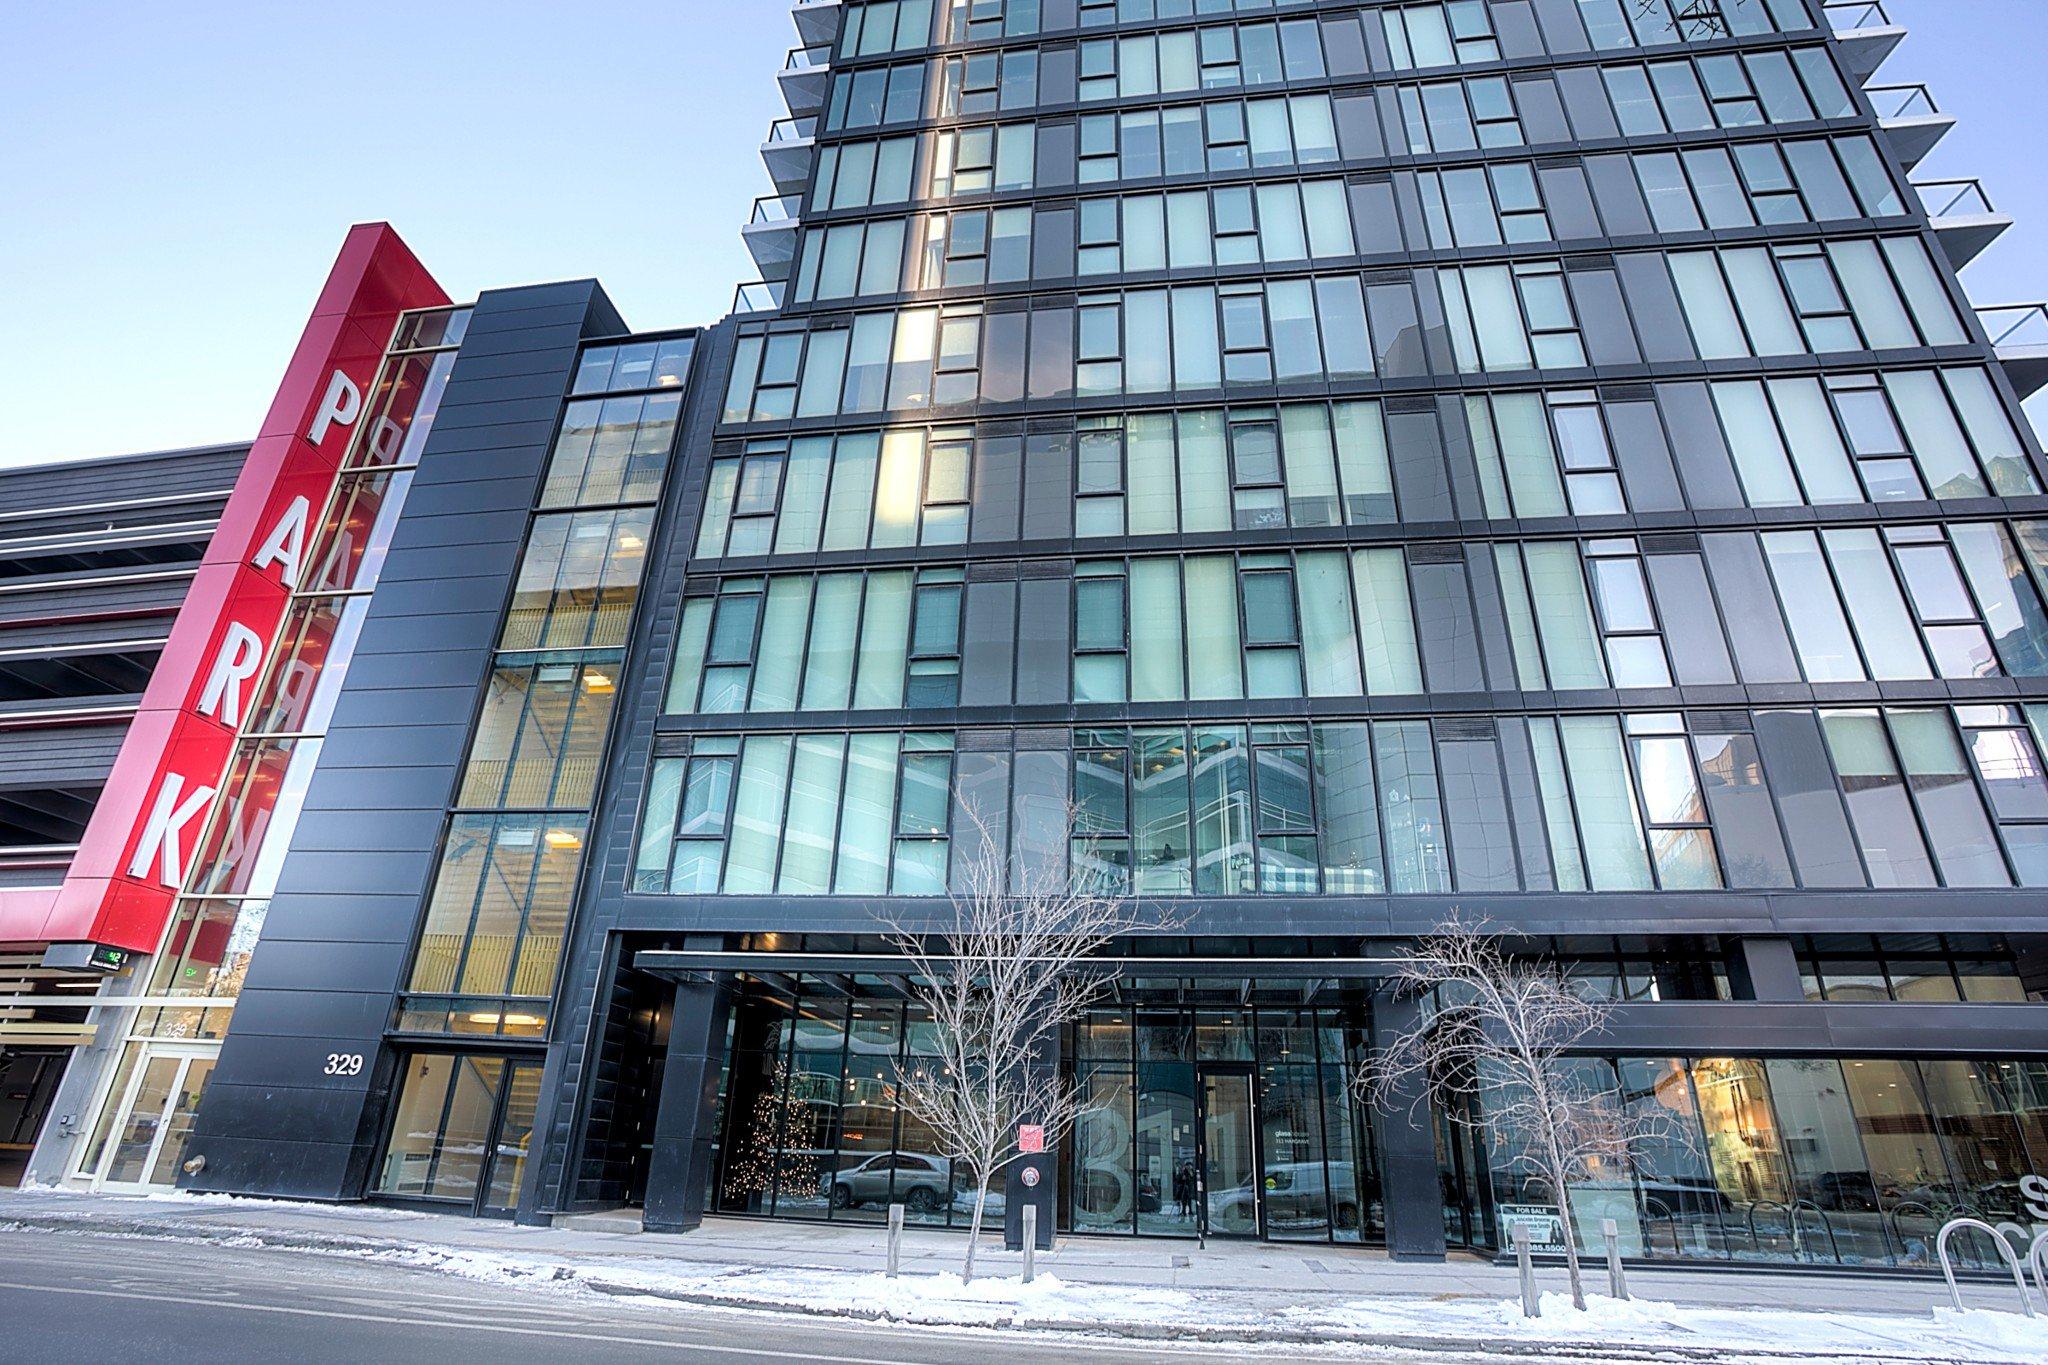 Main Photo: 1810 311 Hargrave Street in Winnipeg: Downtown Condominium for sale (9A)  : MLS®# 1831442